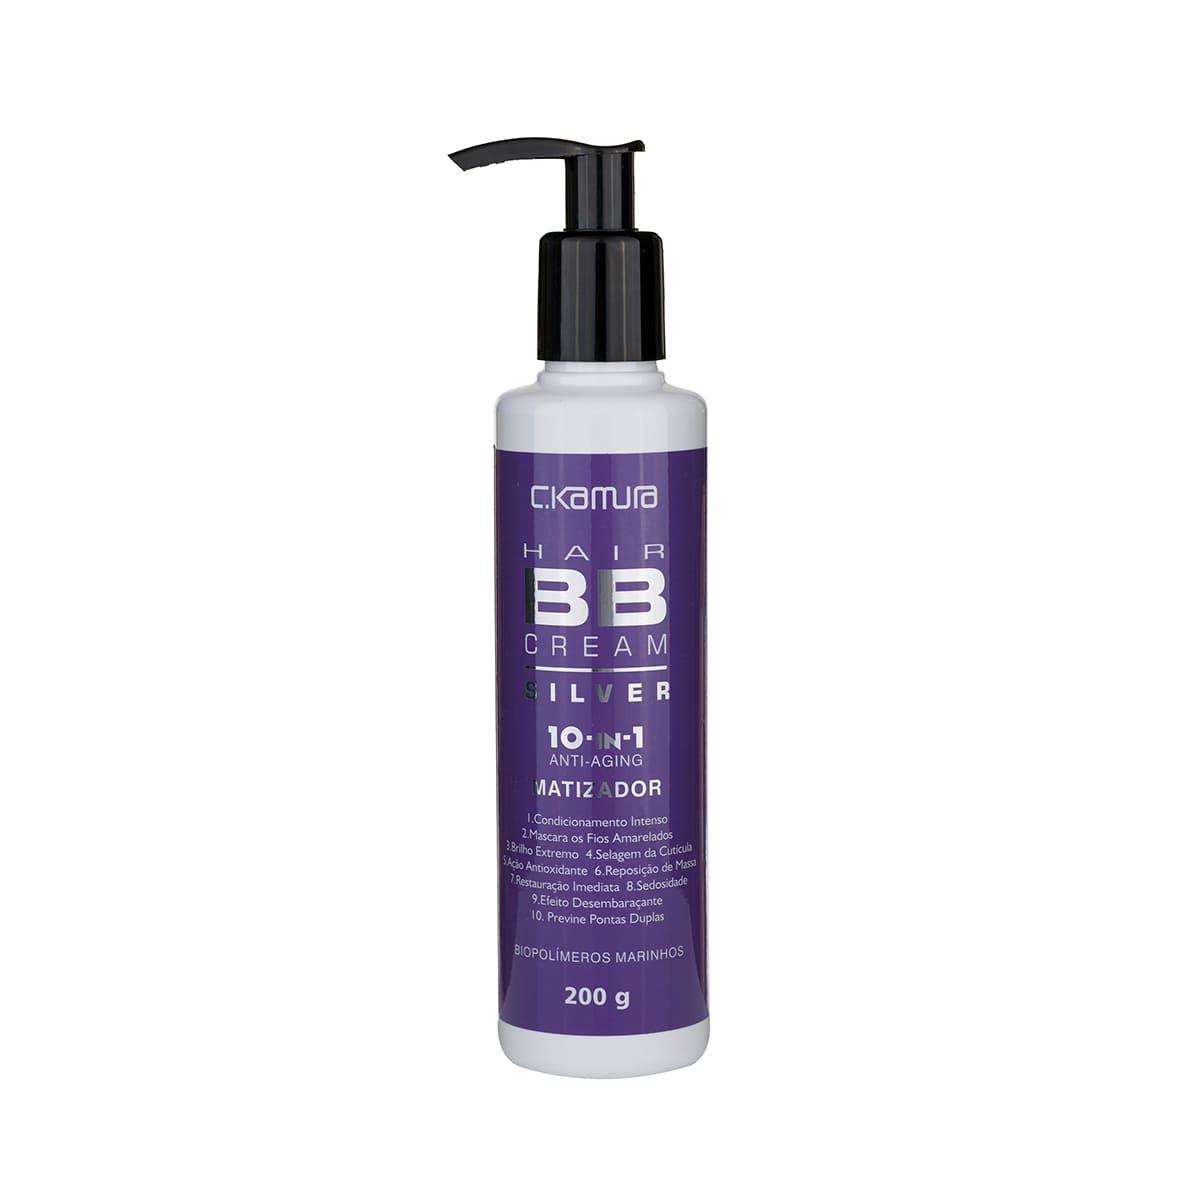 Hair BB Cream Silver 10-In-1 CKamura 200 G